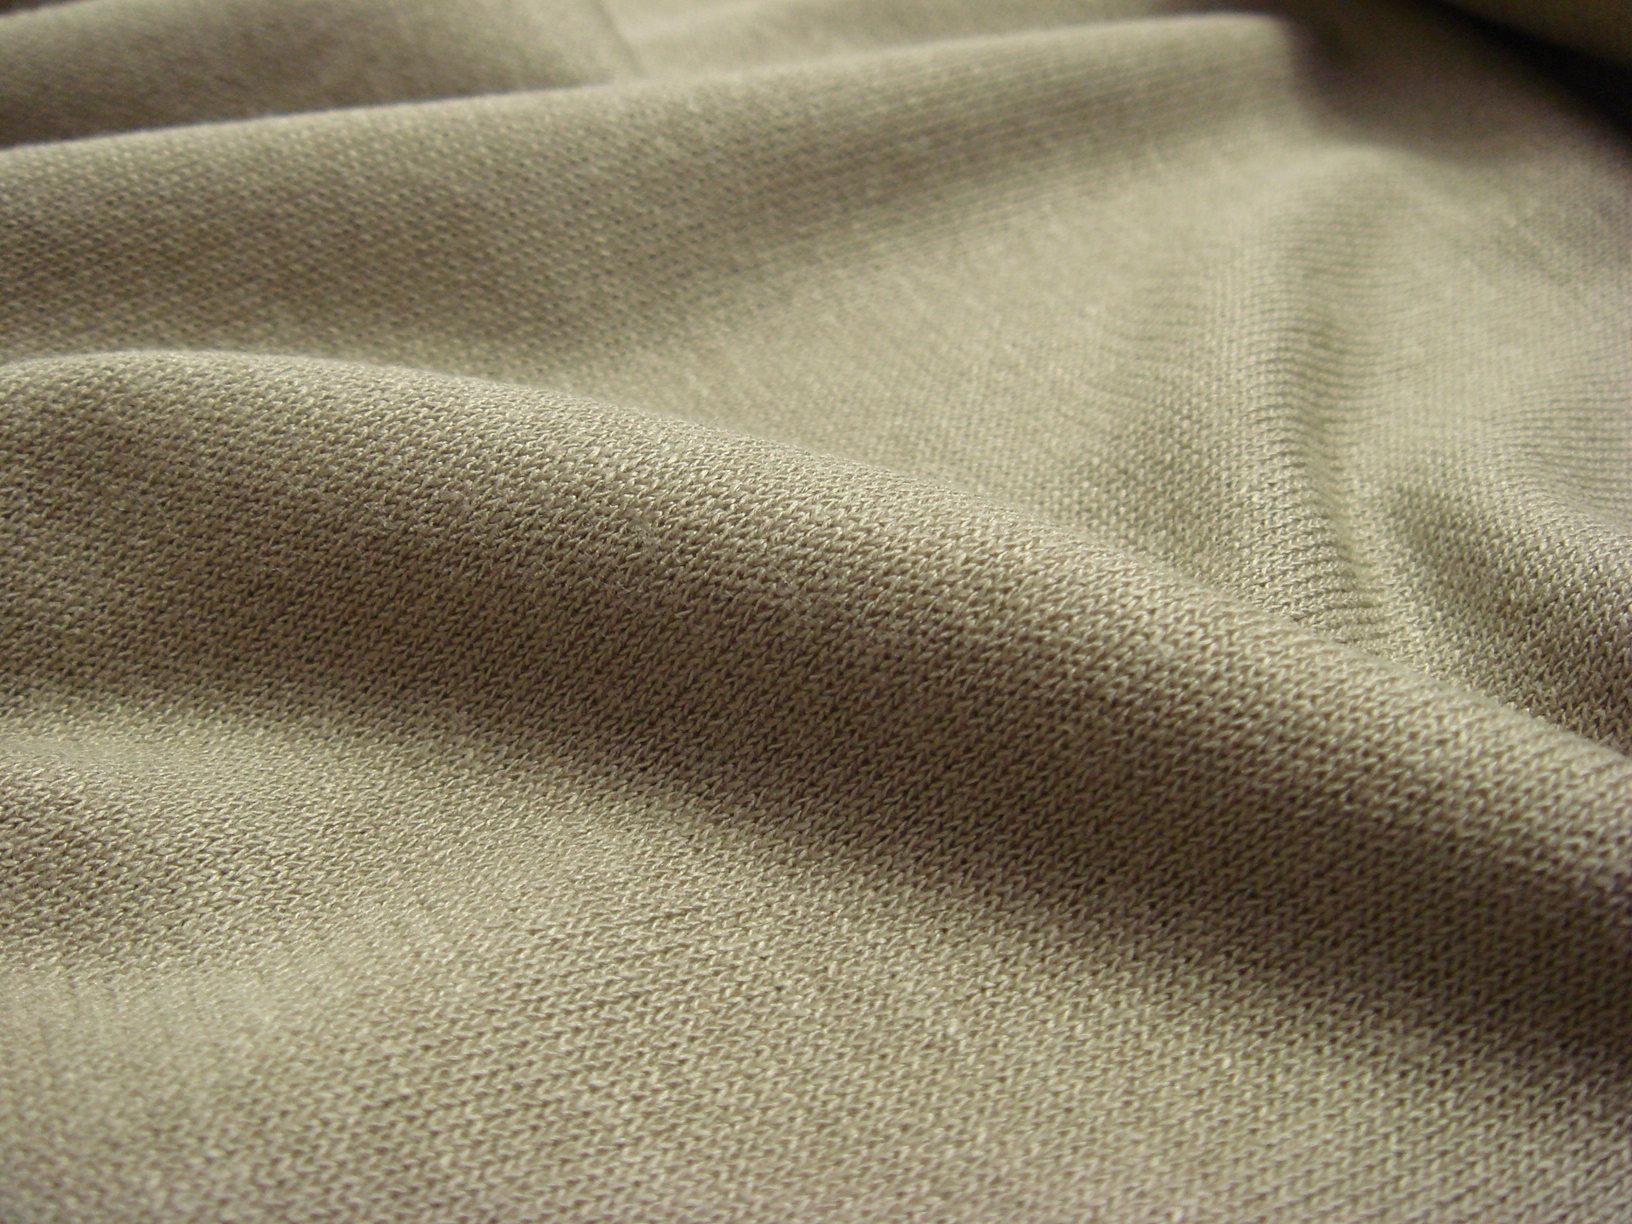 53c0a143d42 Jersey (fabric) - Wikipedia